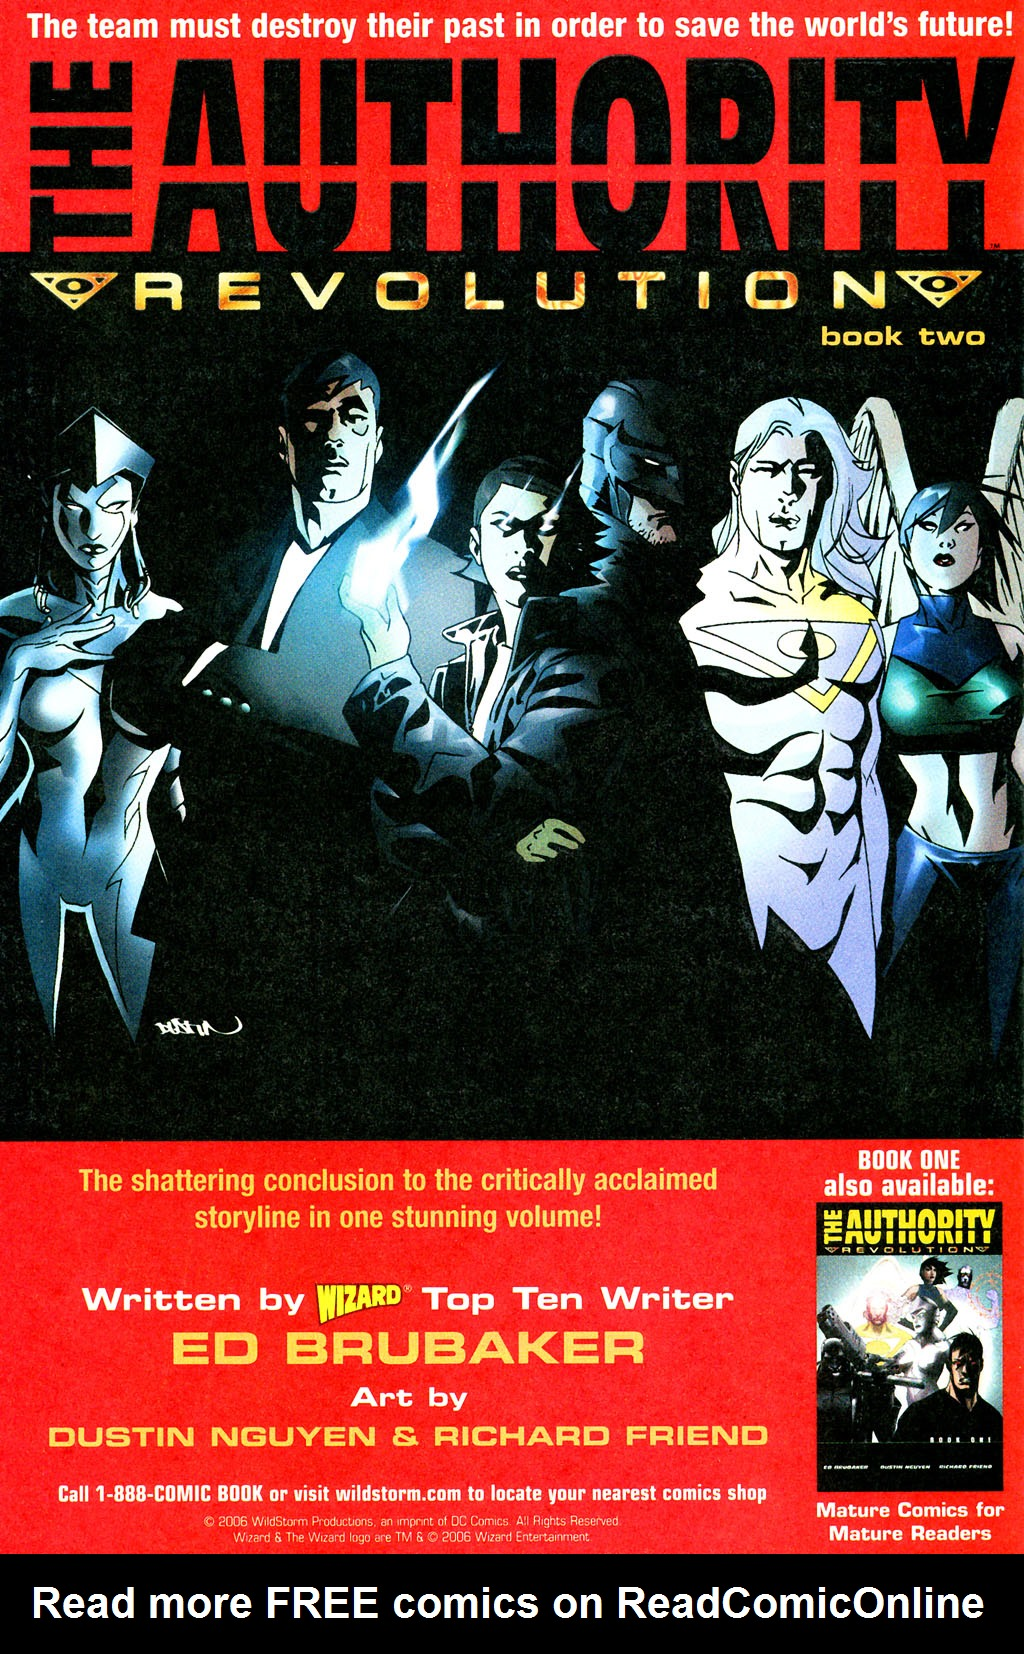 Read online The Exterminators comic -  Issue #3 - 29